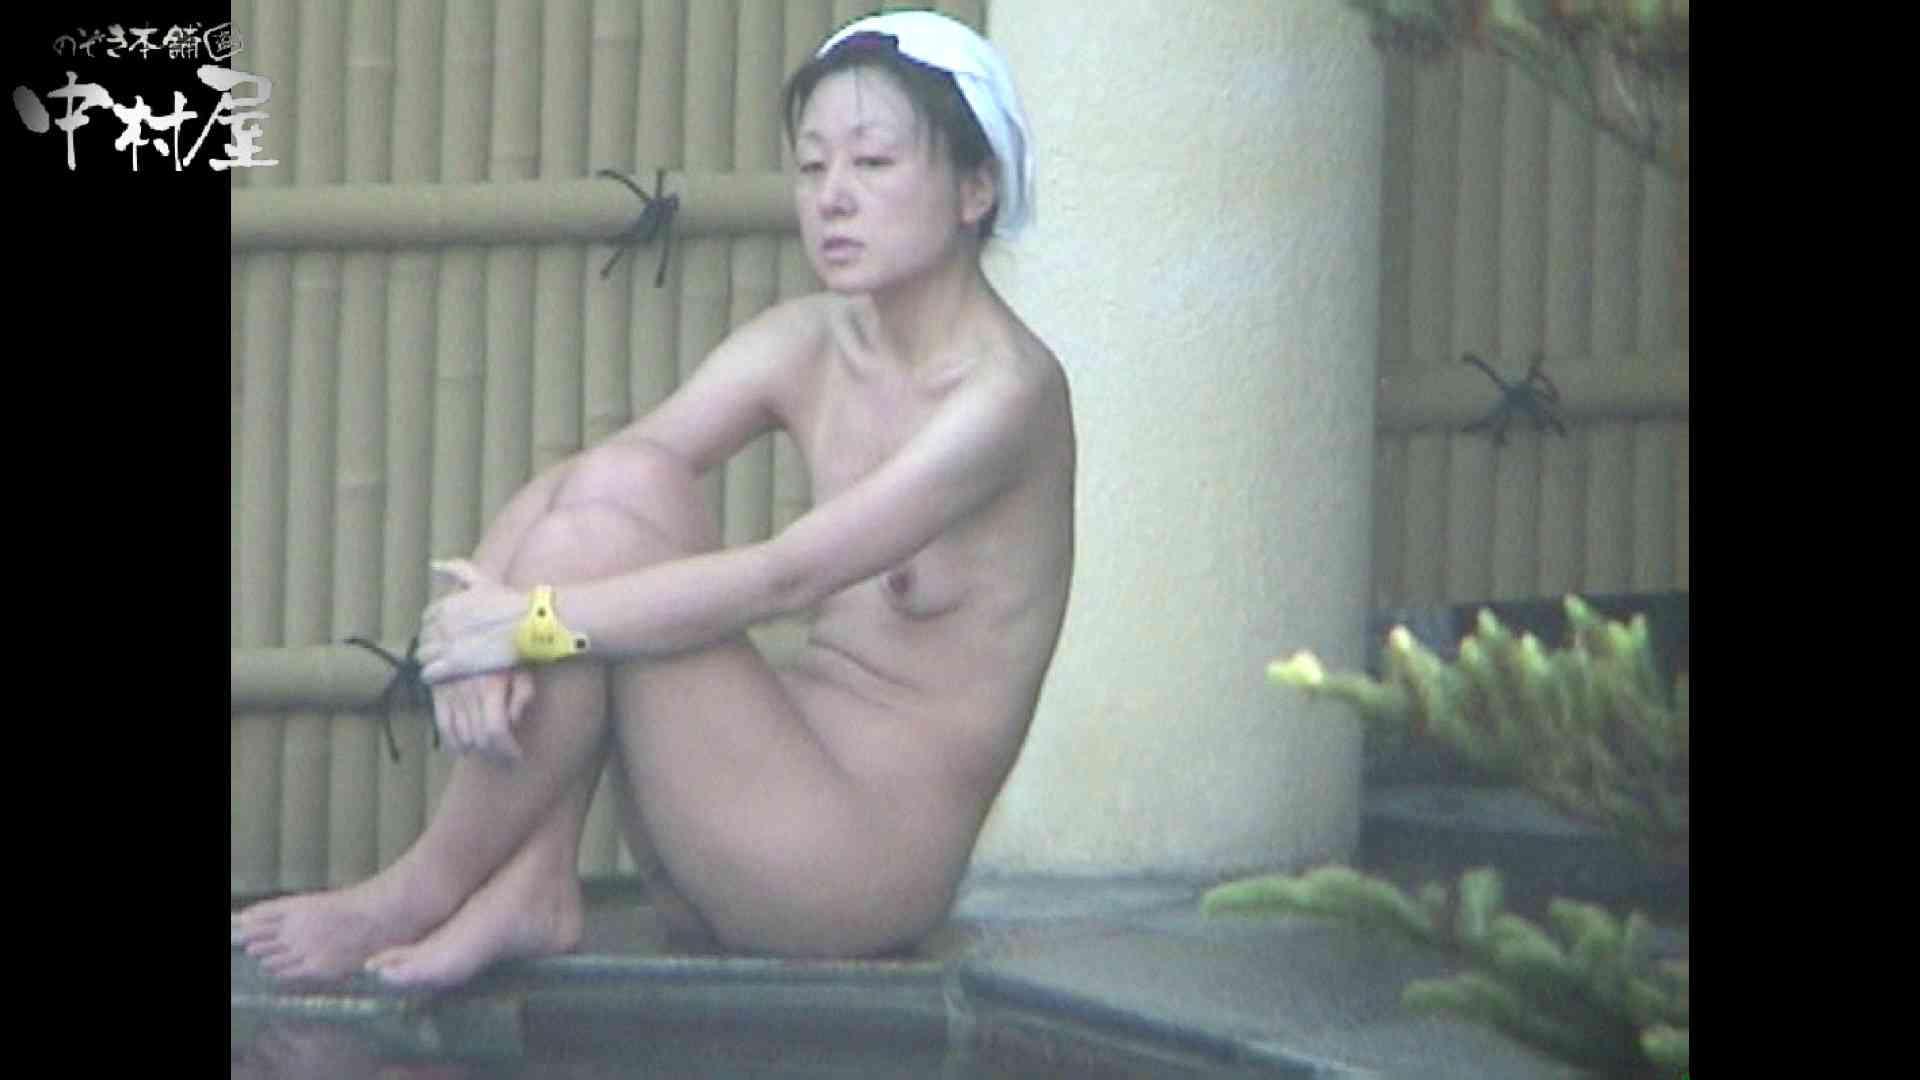 Aquaな露天風呂Vol.958 露天 オメコ無修正動画無料 82枚 44